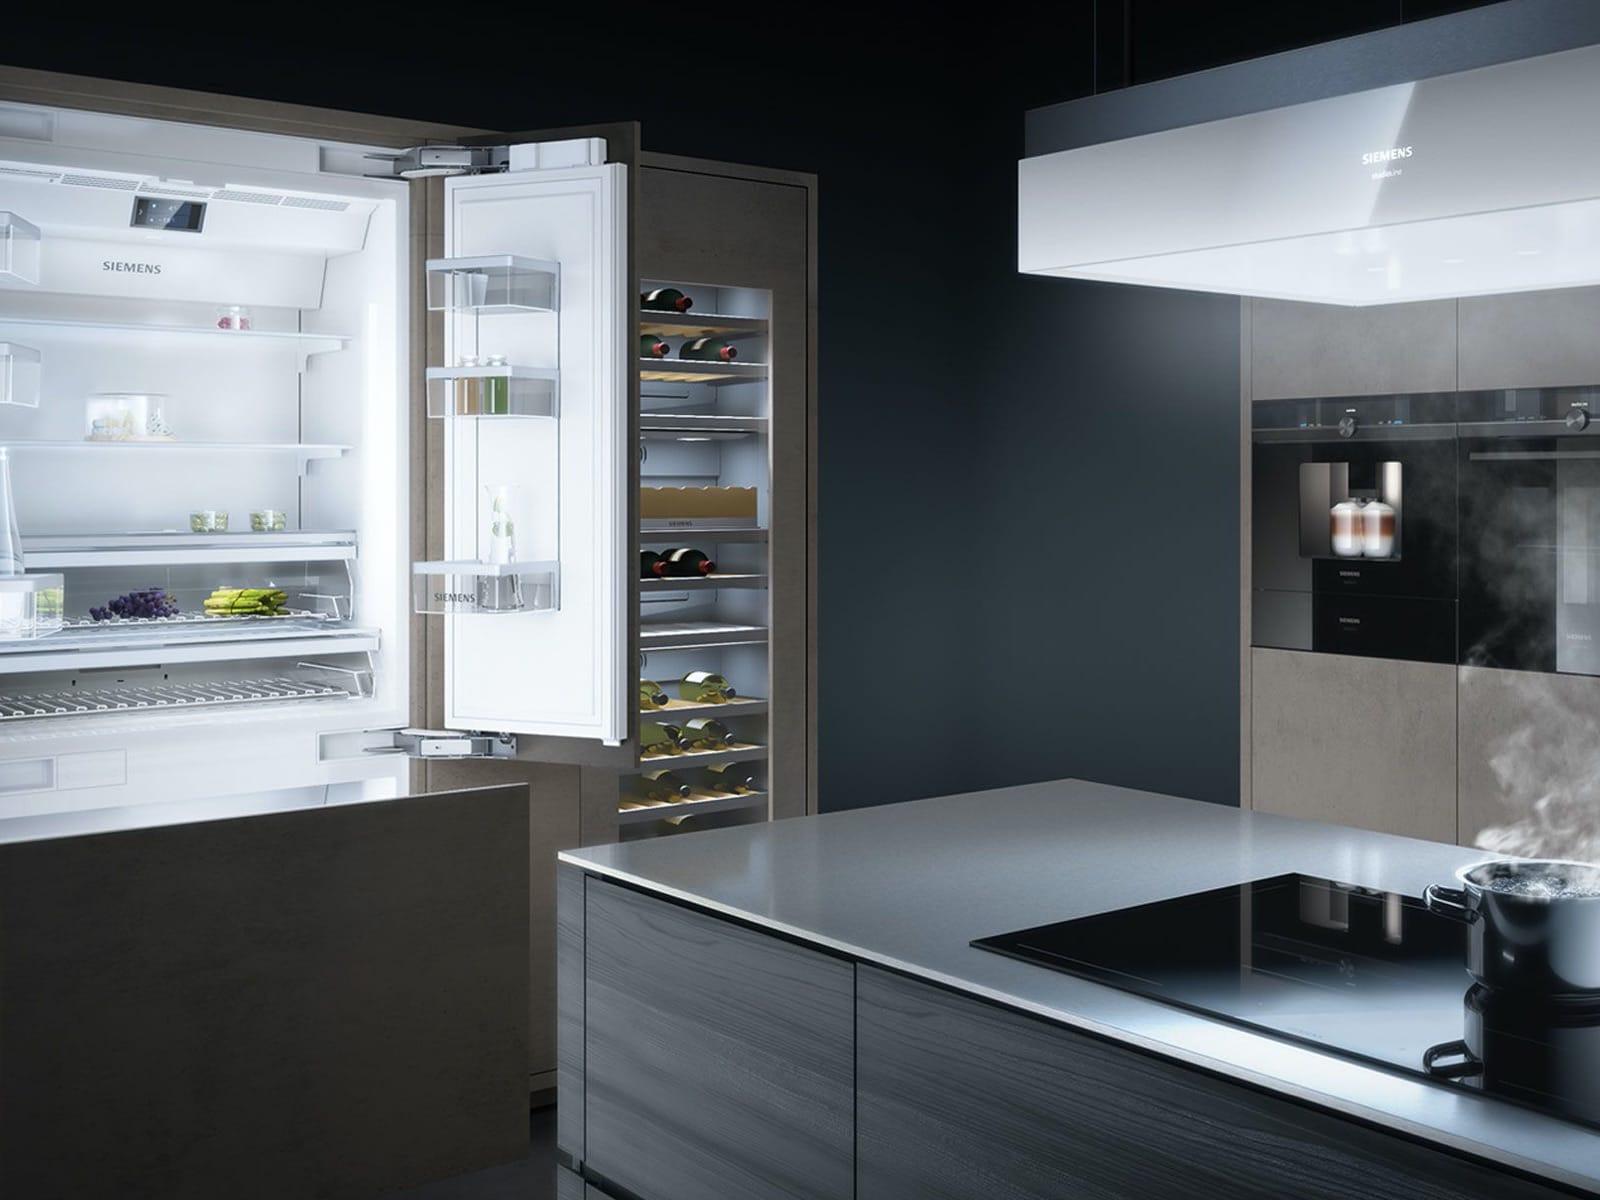 Siemens BSH Home Appliances UI/UX Design